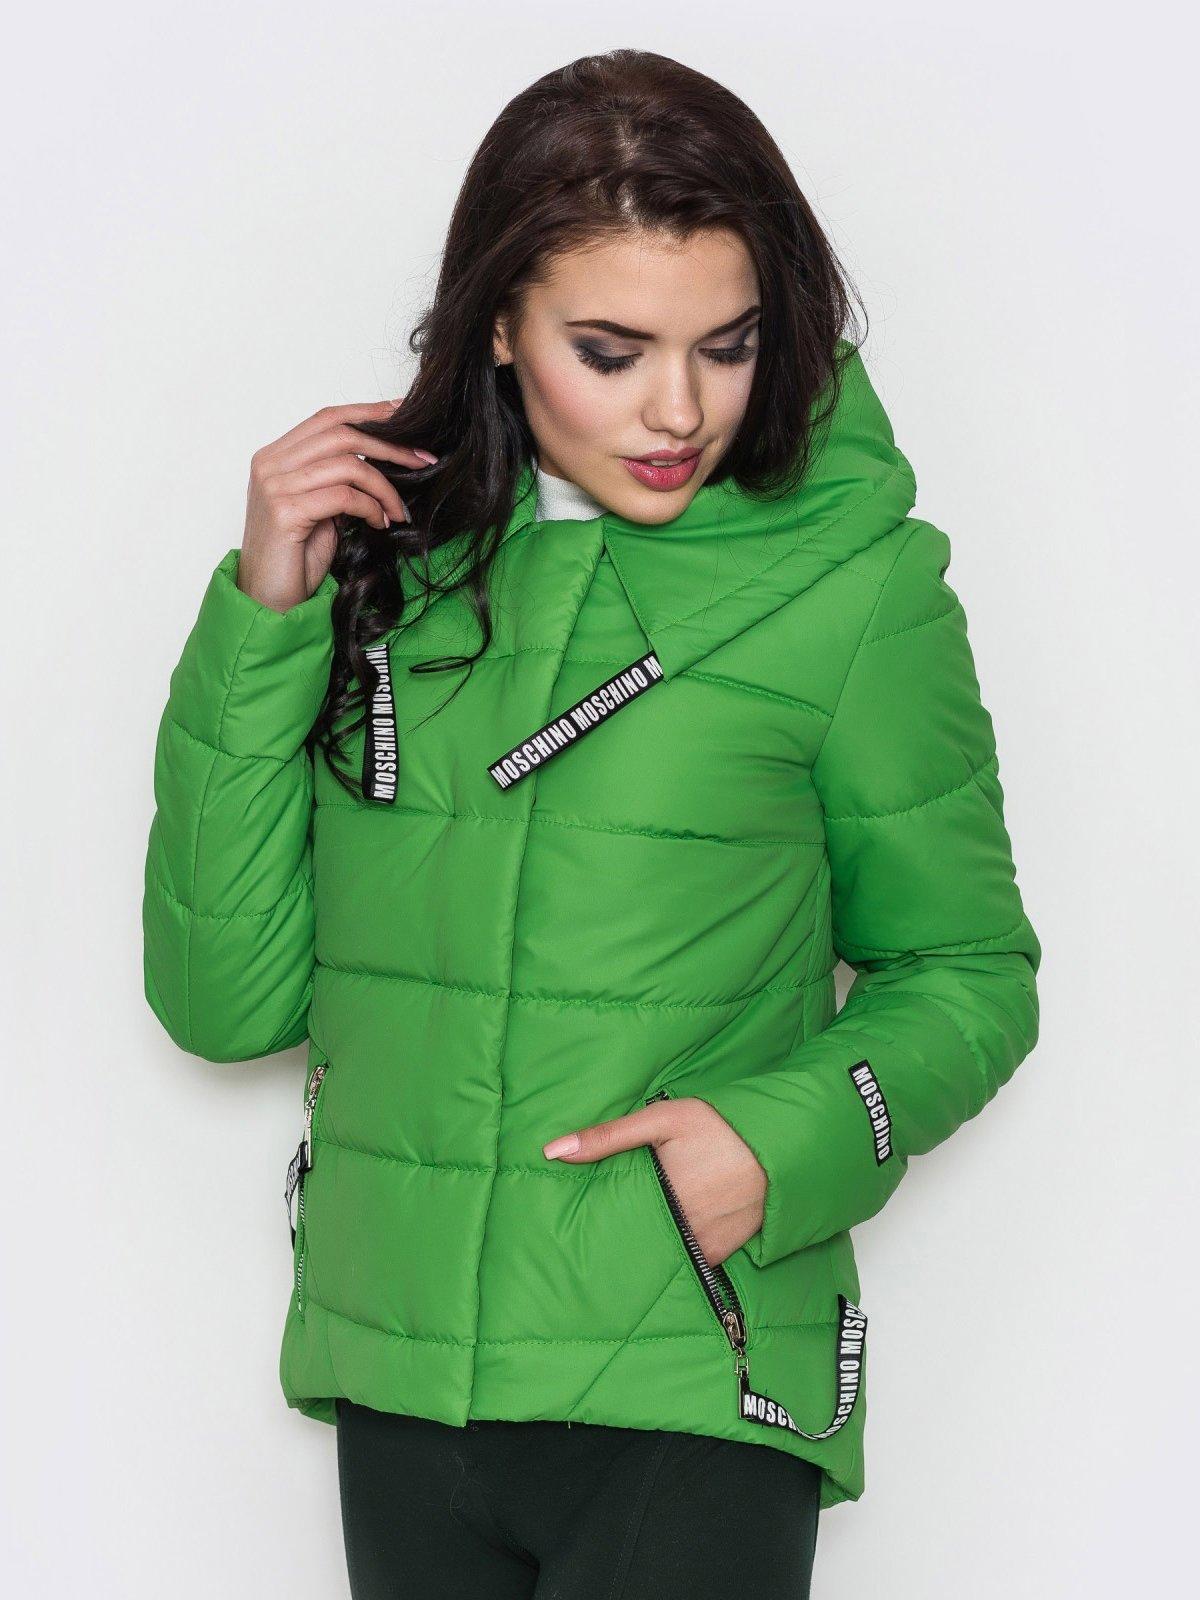 Куртка зеленая | 3532554 | фото 2